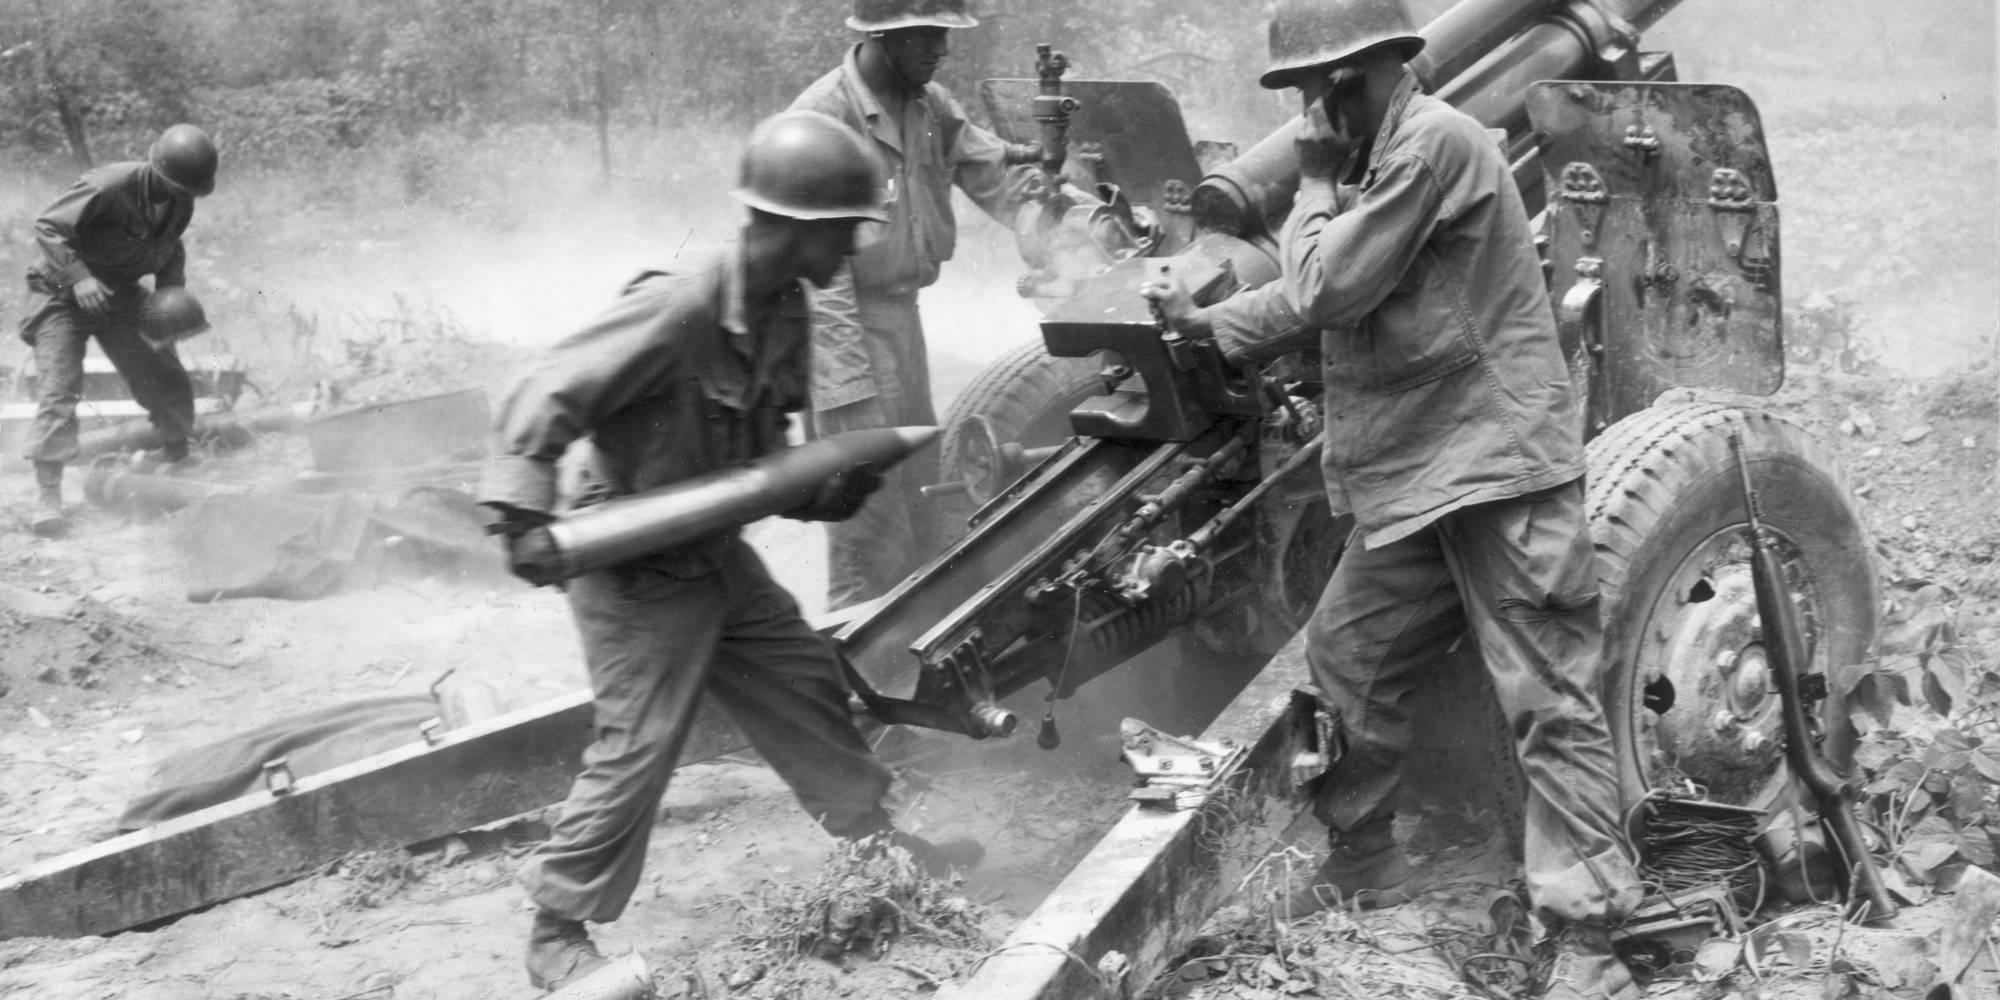 soldiers load howitzer gun